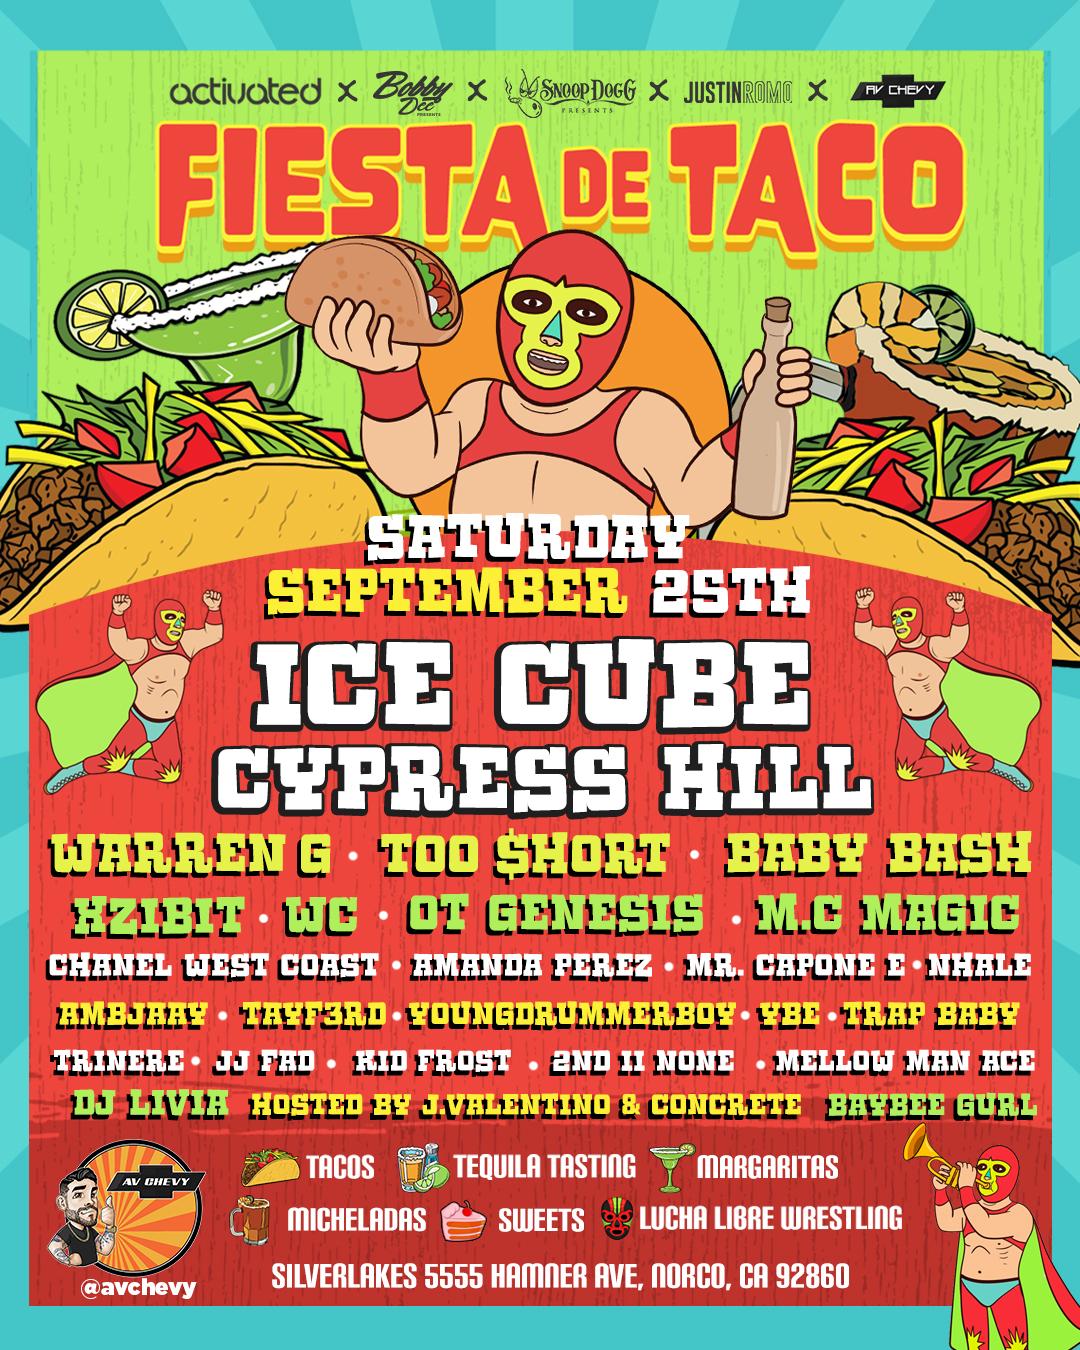 Fiesta-de-Taco-IG-2-